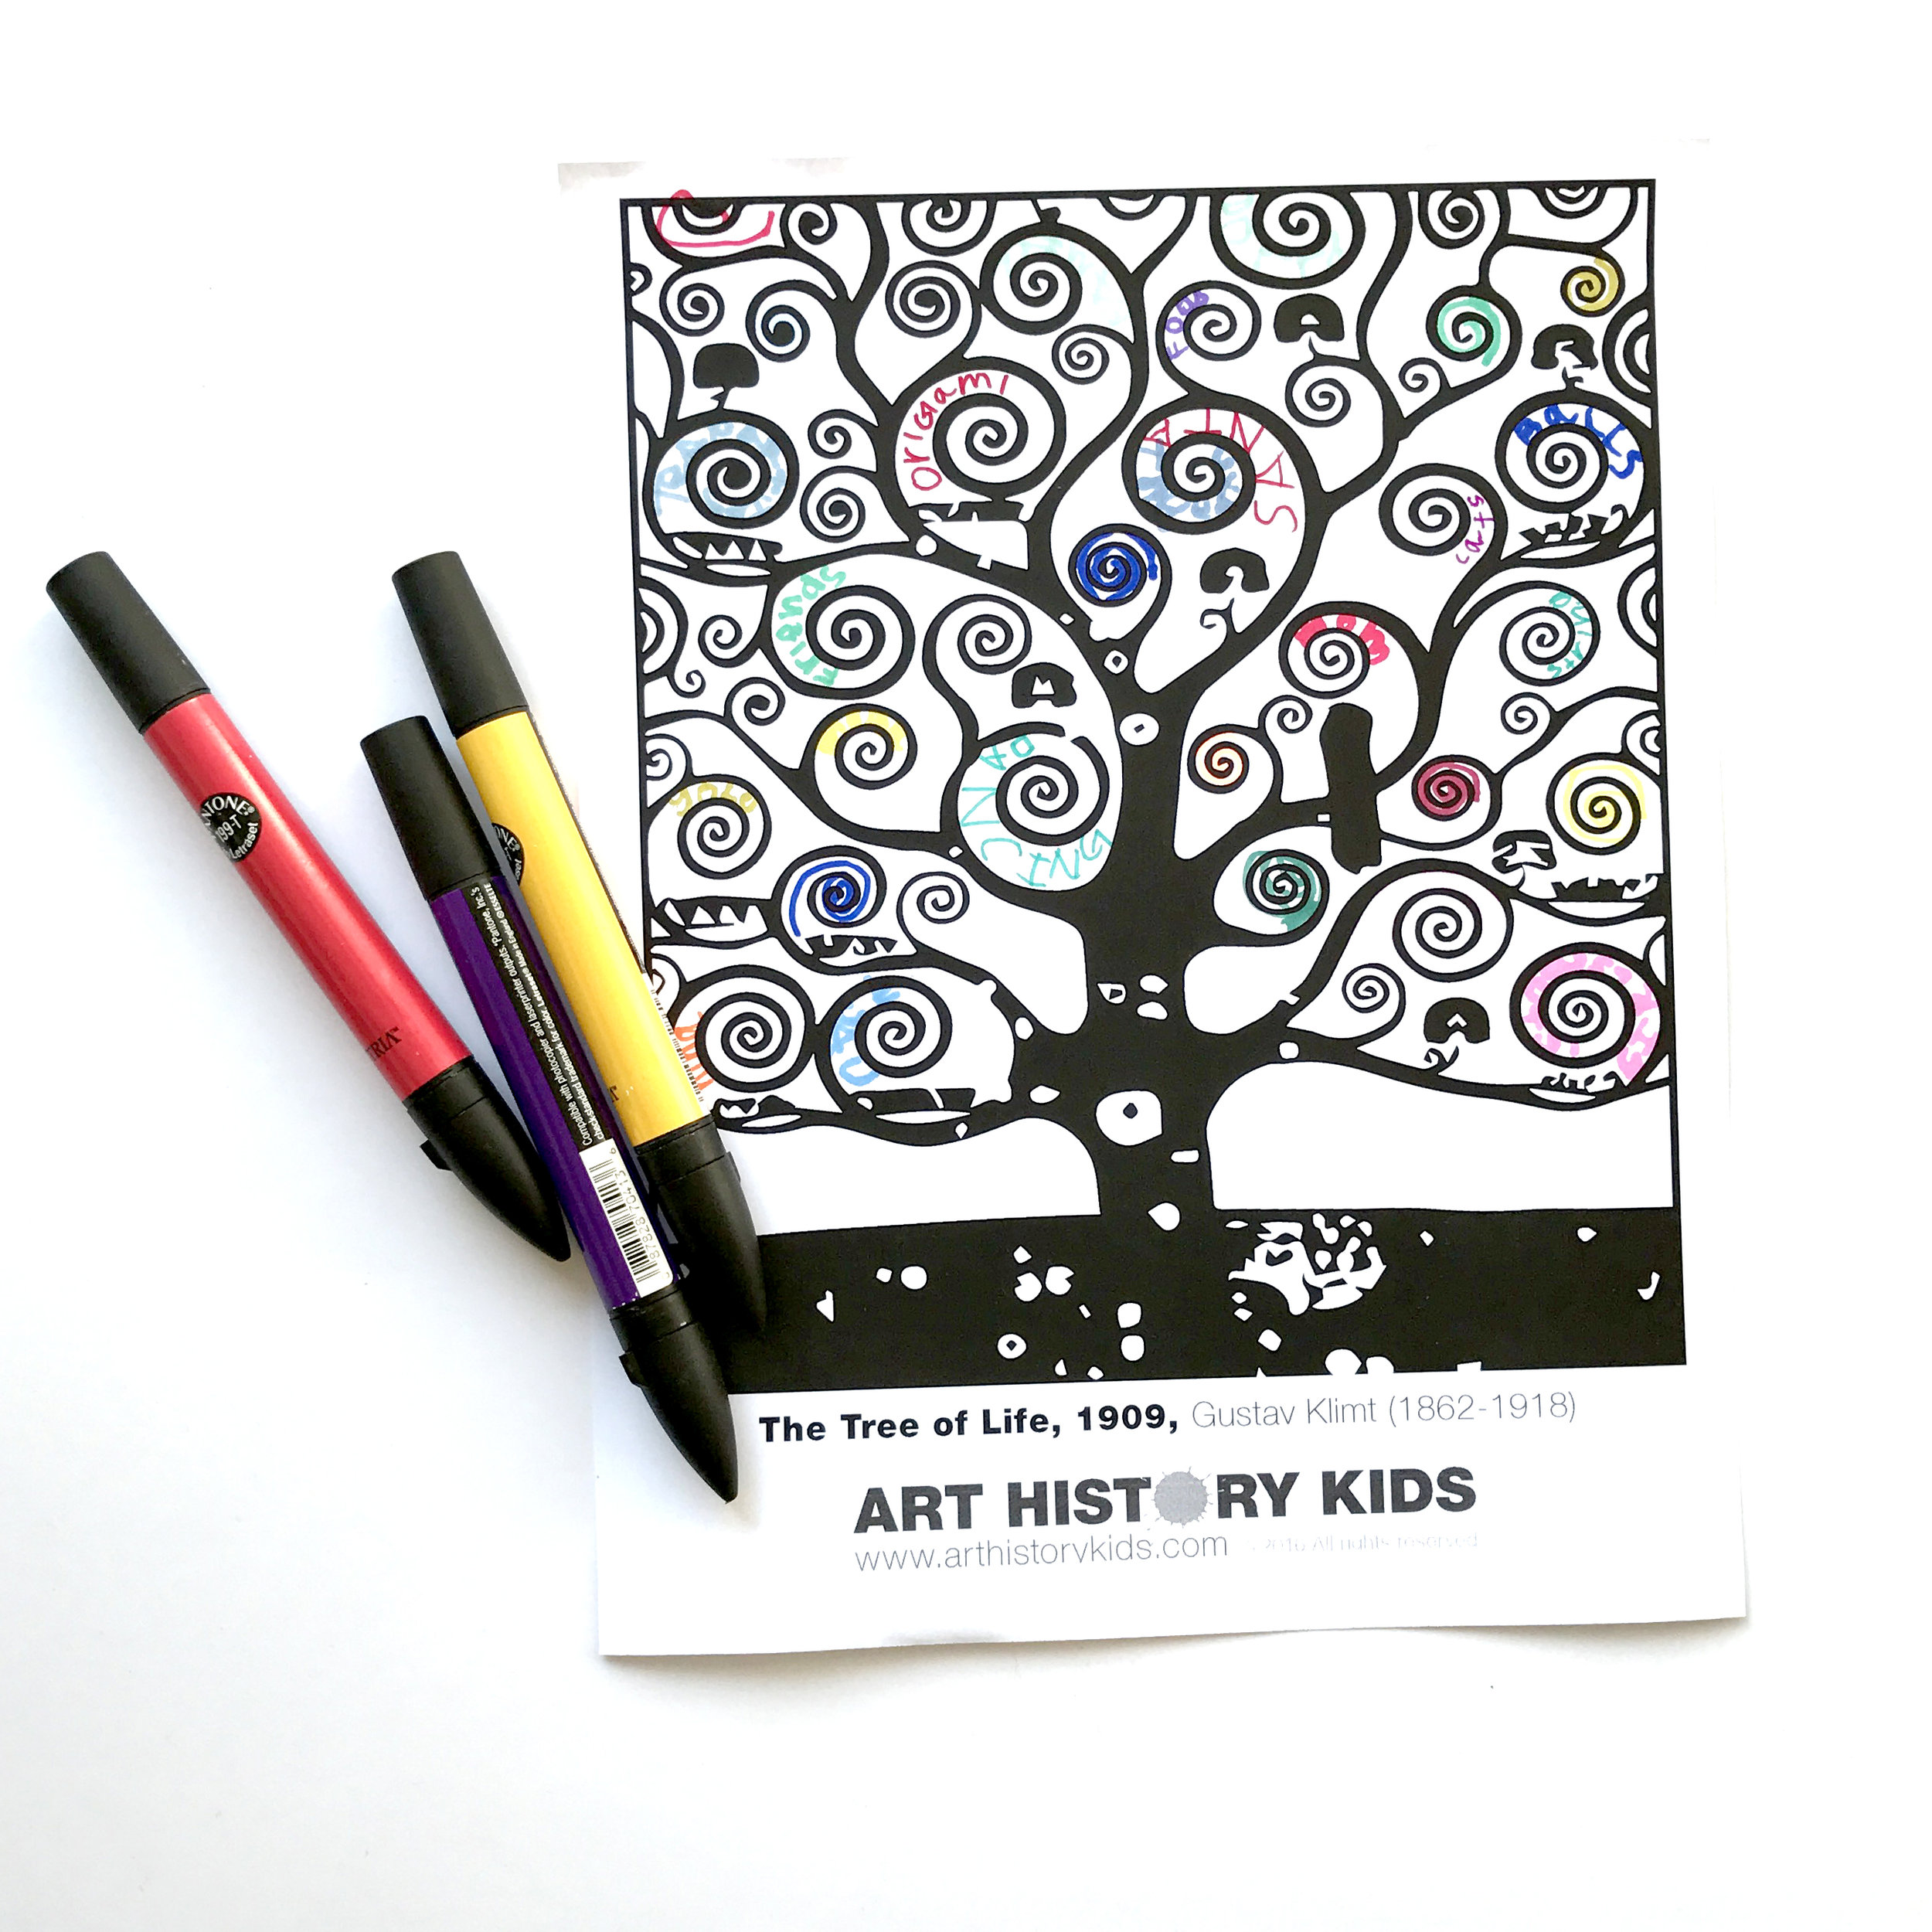 Gustav Klimt art history project for kids. Free printable activity!